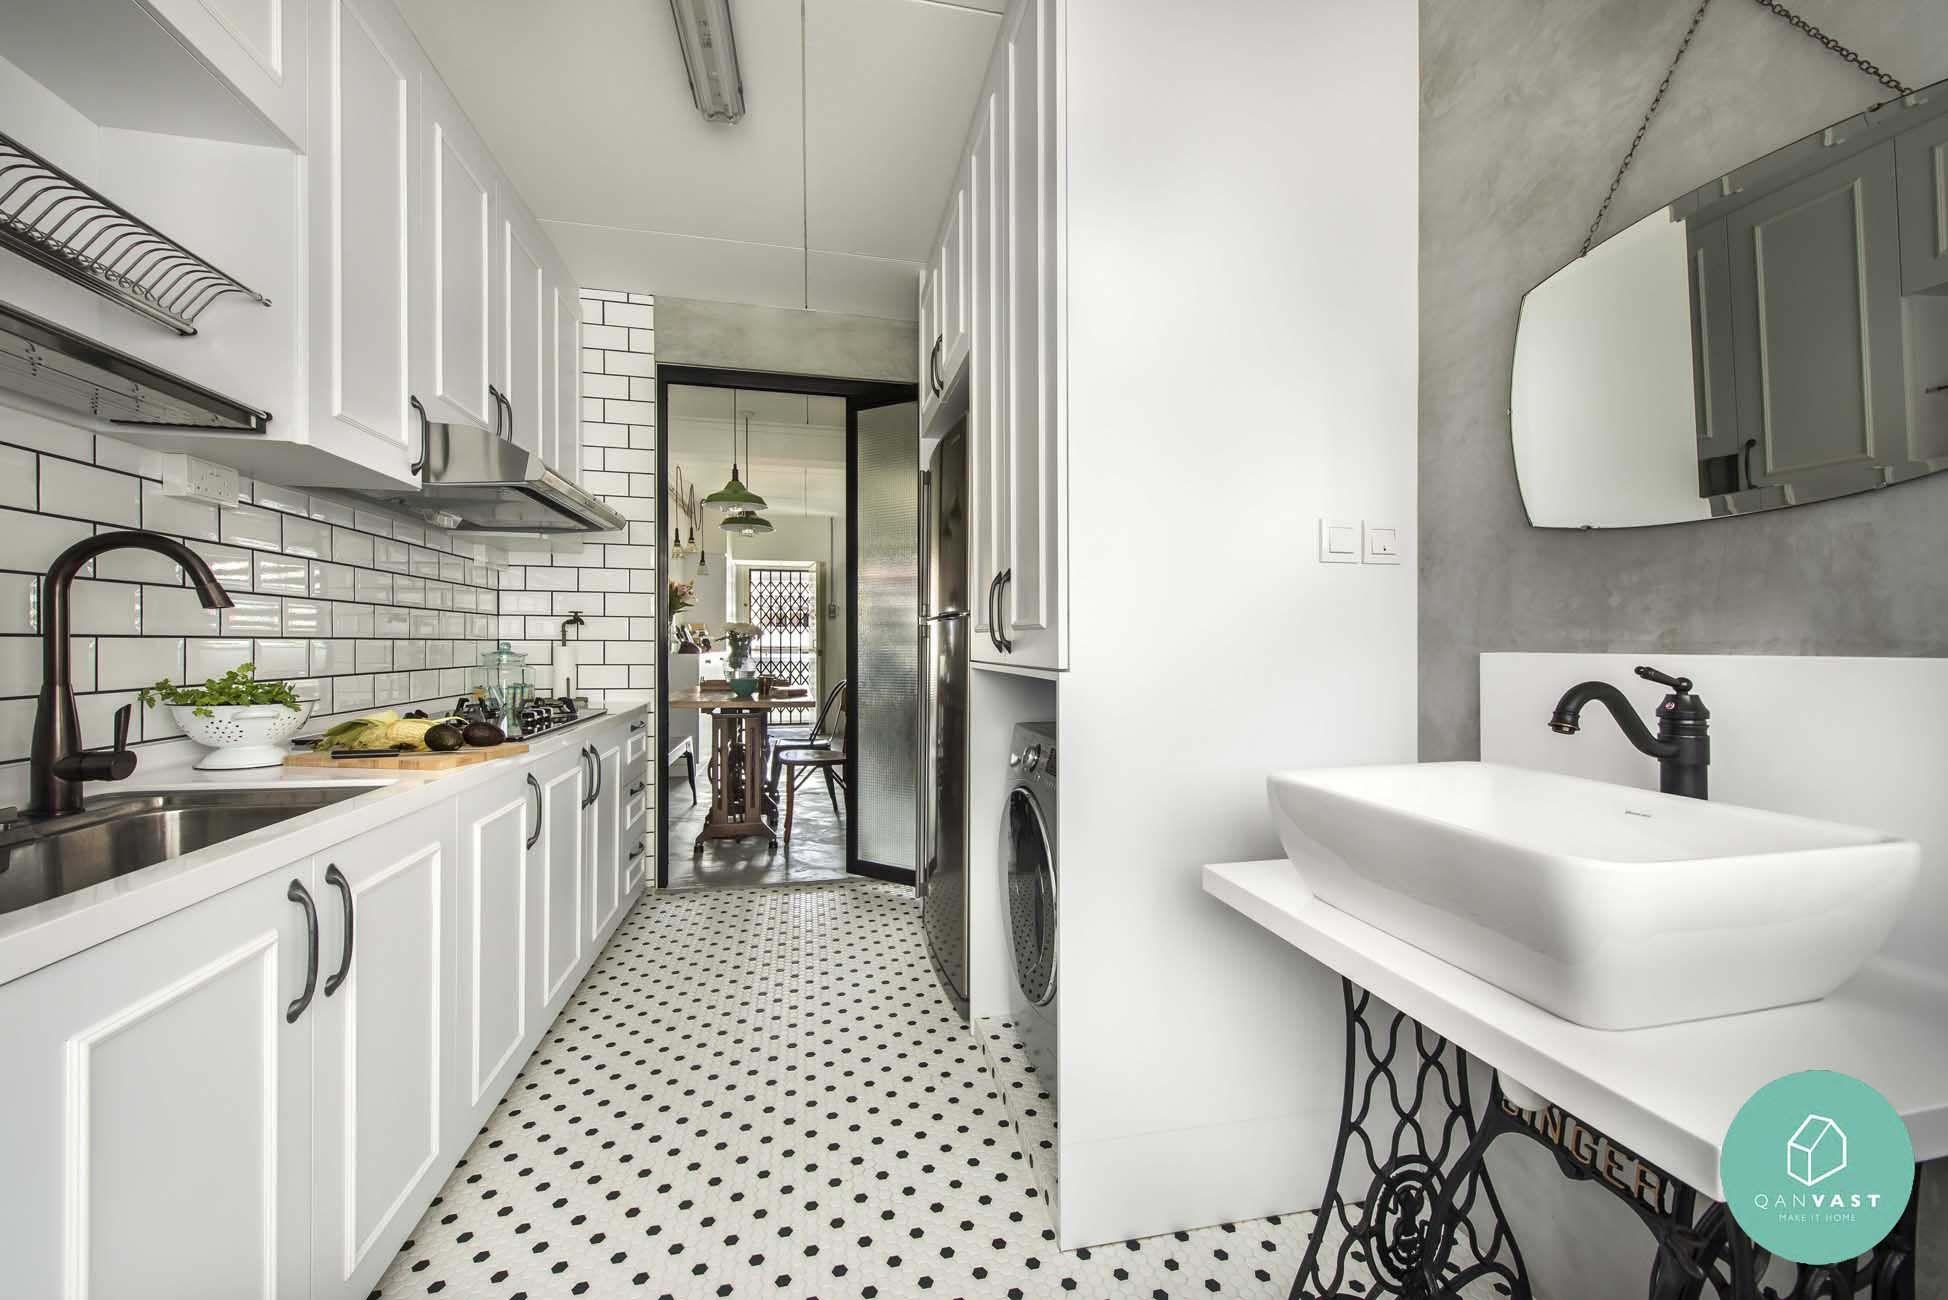 10 beautiful home renovations under 50000  interior